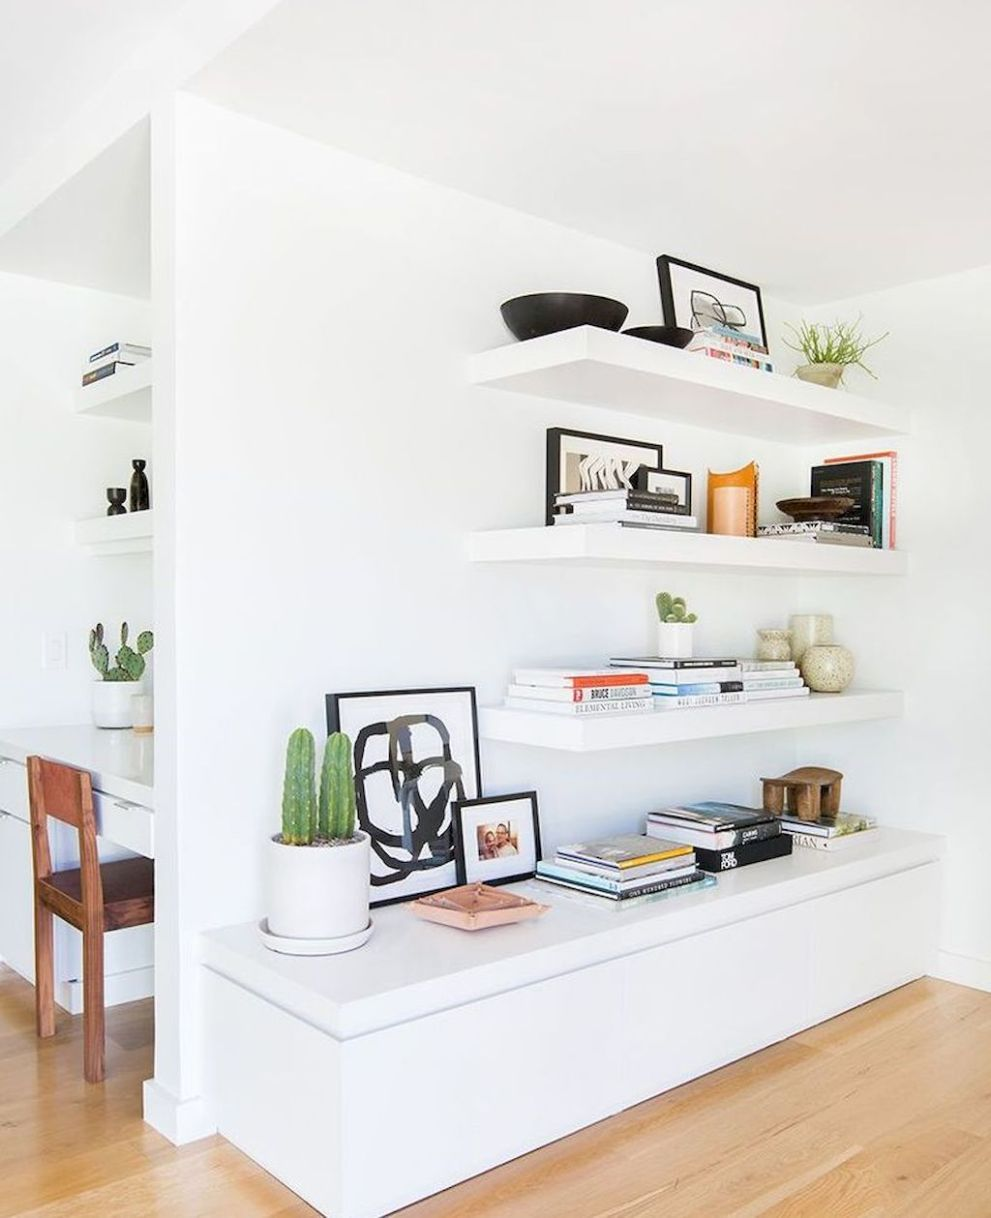 55 minimalist living room ideas 5baca8e277524  floating